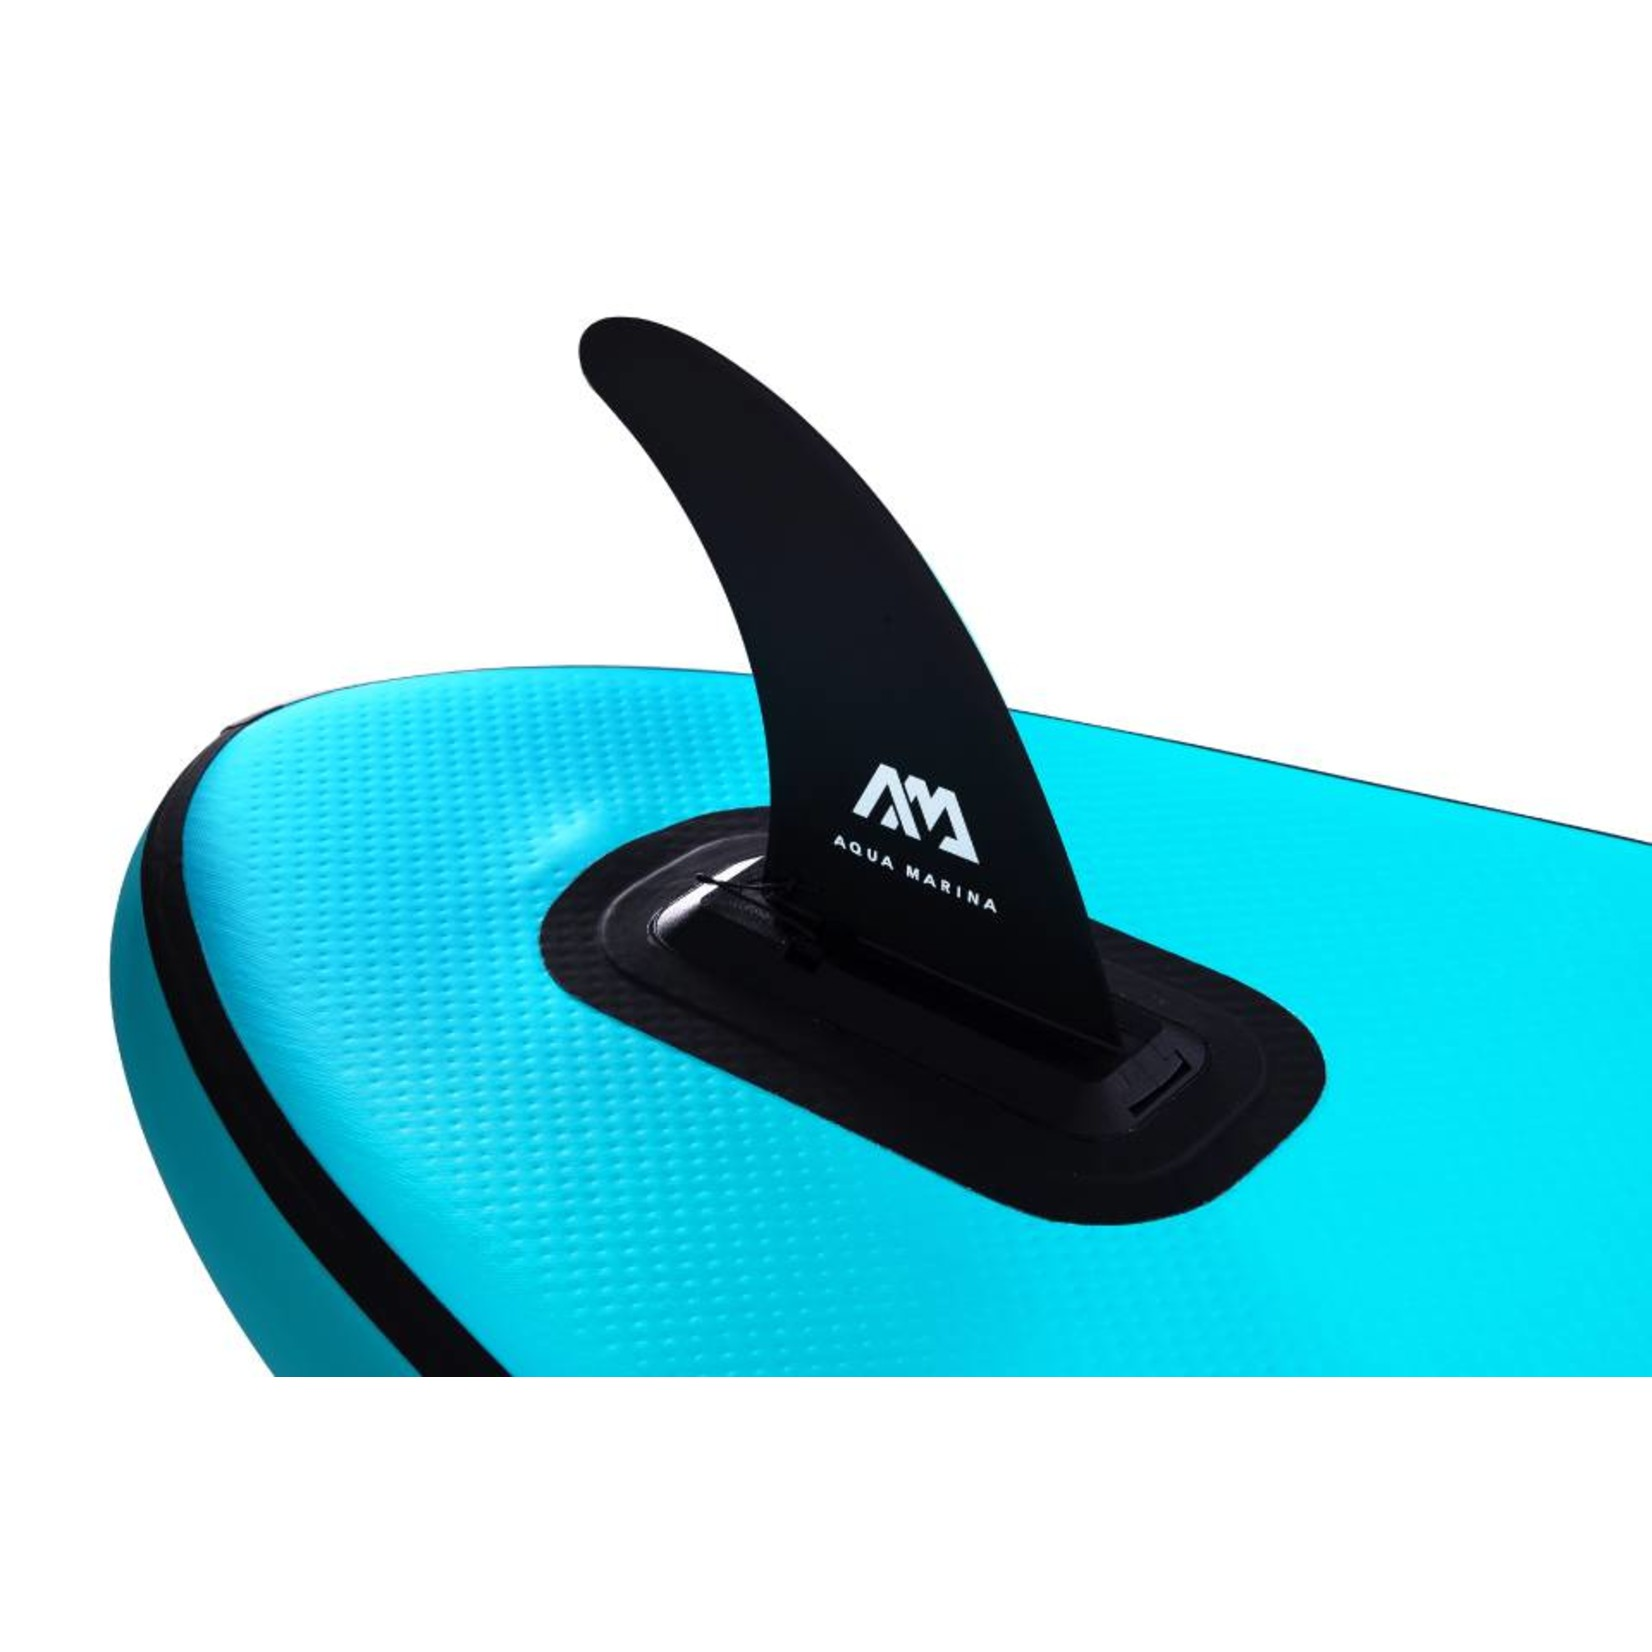 Aqua Marina All Round Vapor - Inflatable Paddle Board